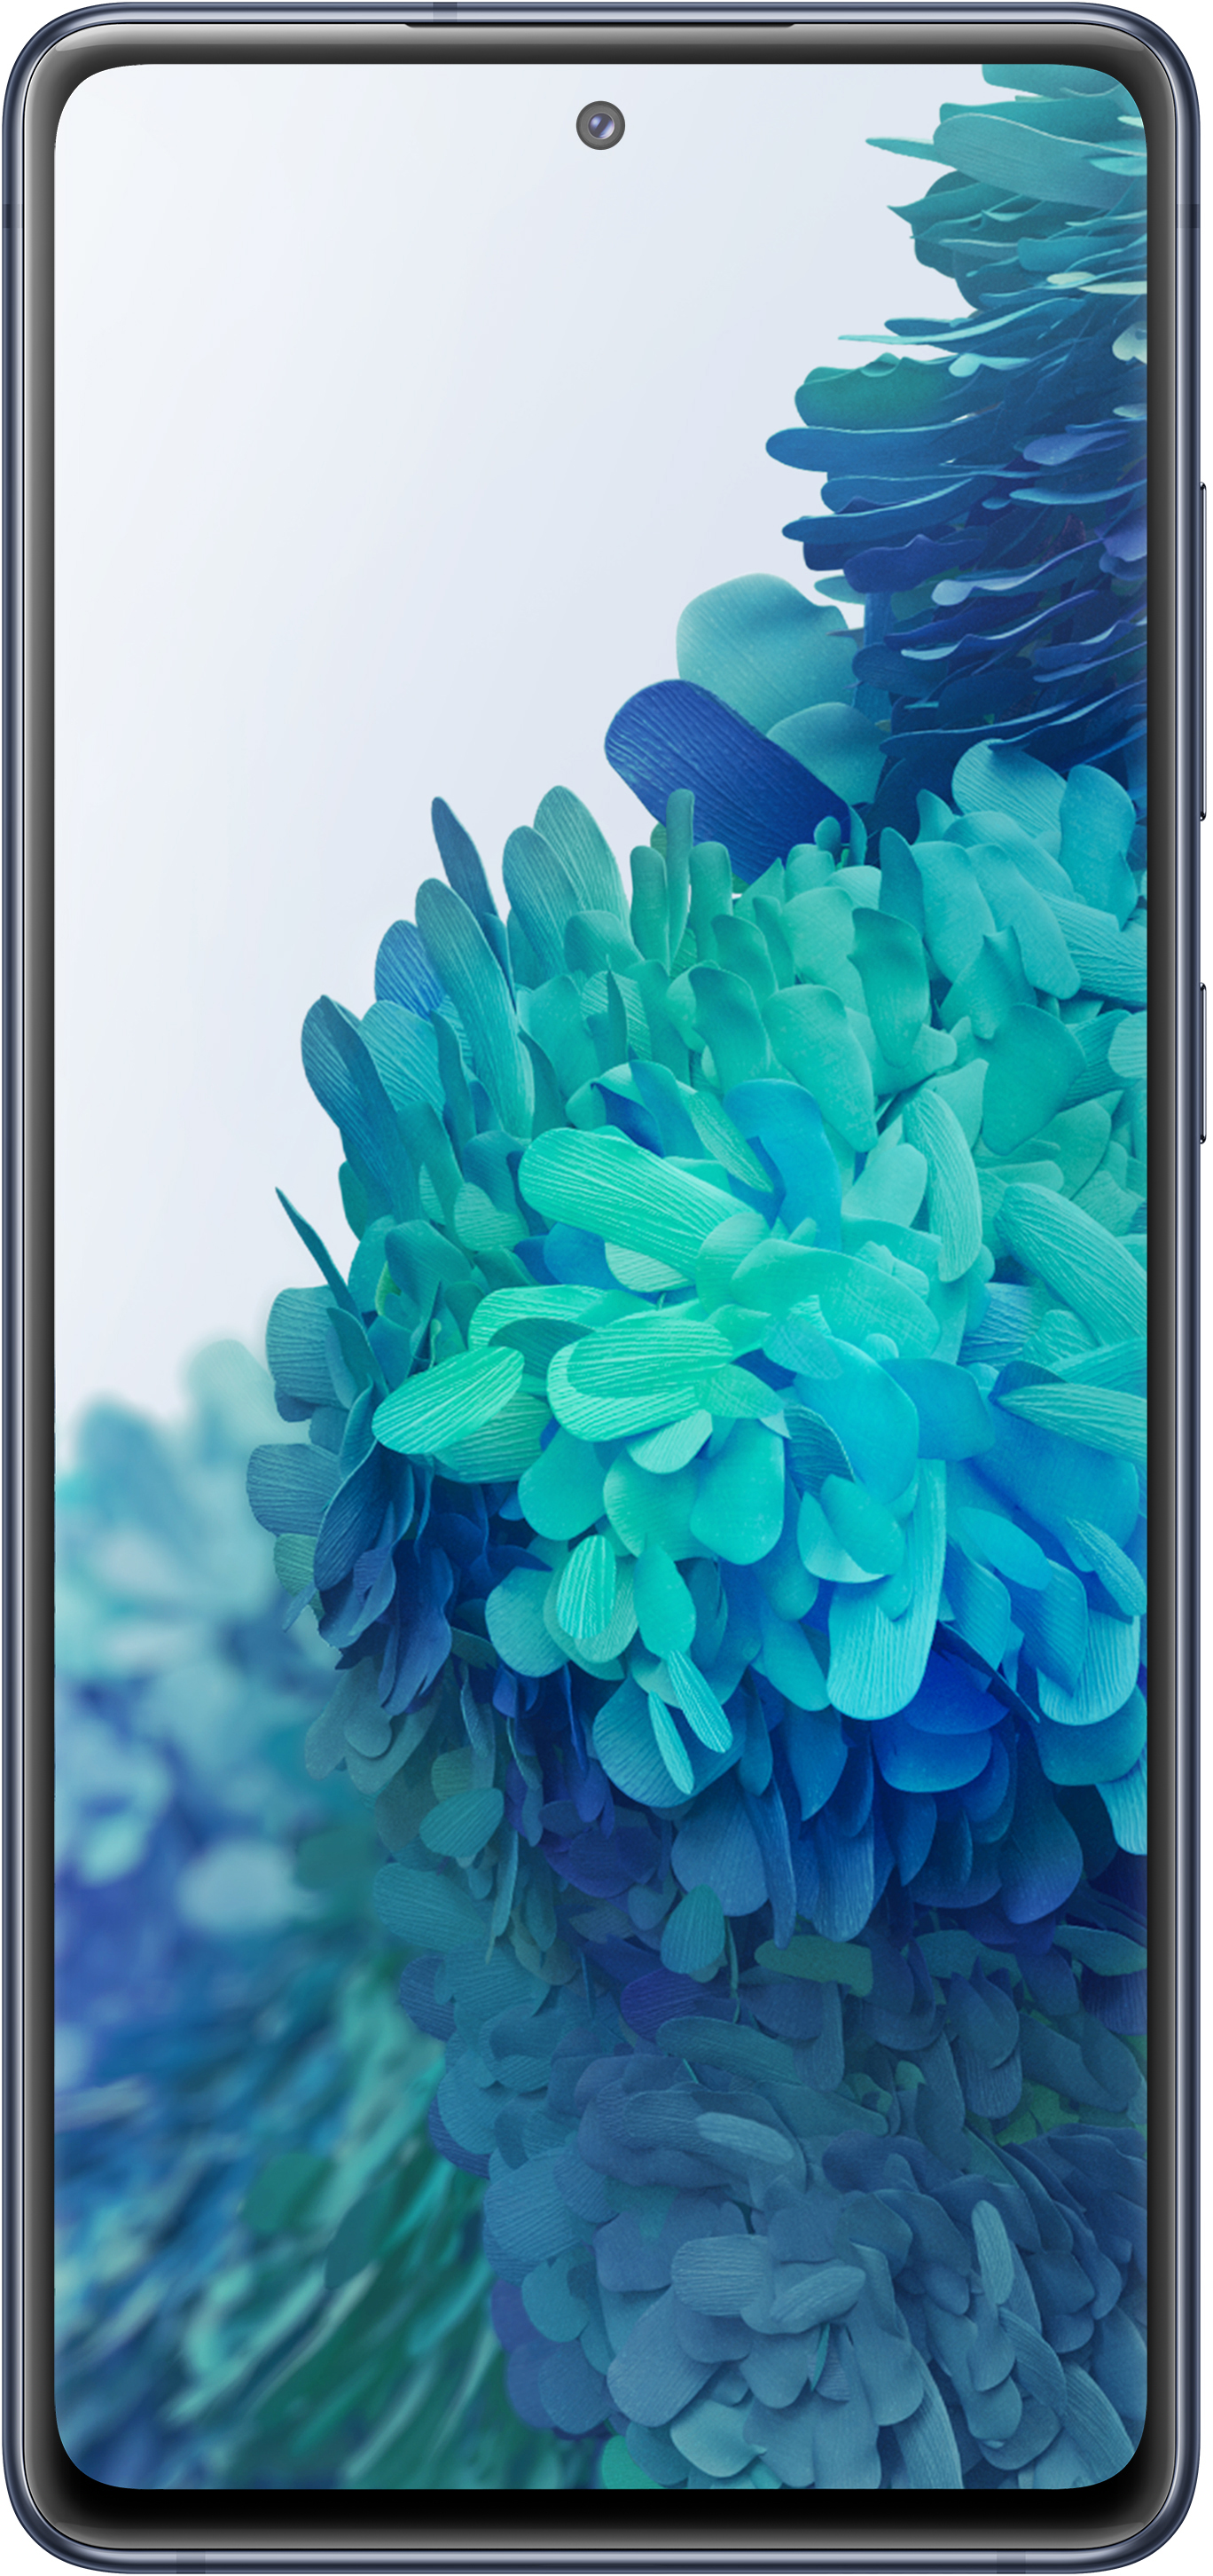 Смартфон Samsung Galaxy S20 FE 256GB Navy Blue (SM-G780F) Galaxy S20 FE 256GB Navy Blue (SM-G780F)